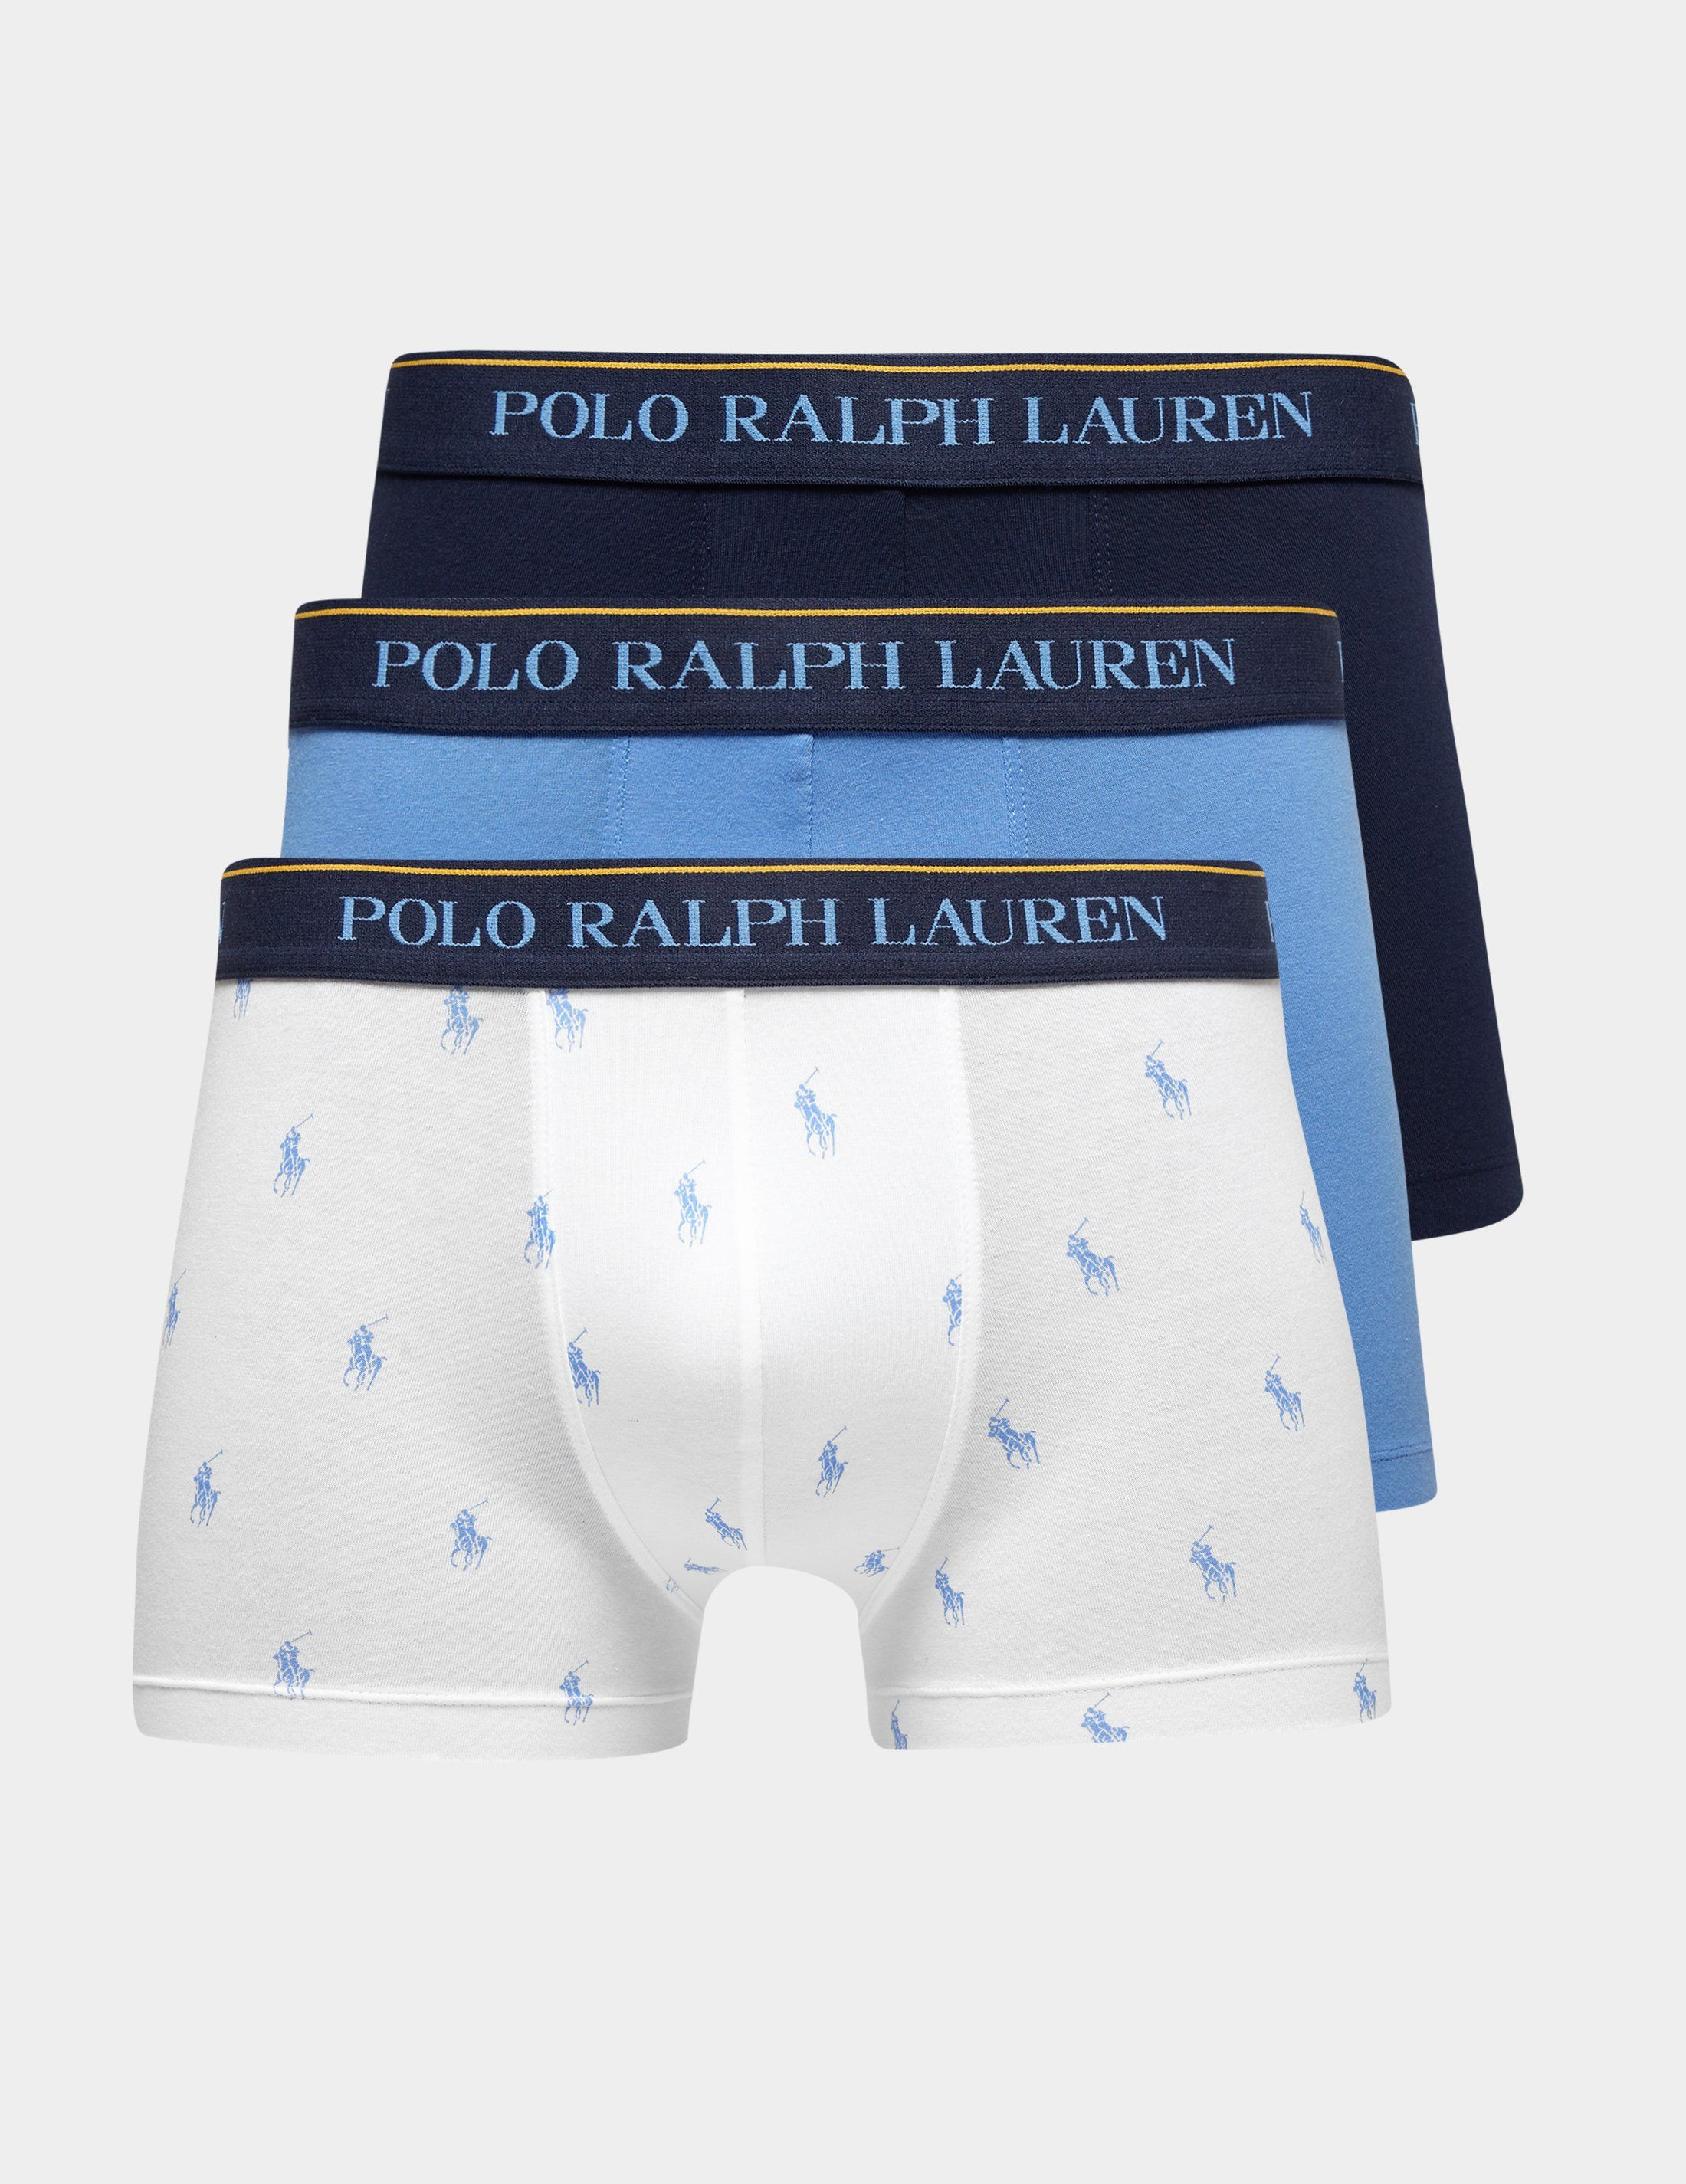 Polo Ralph Lauren 3-Pack Print Boxer Shorts